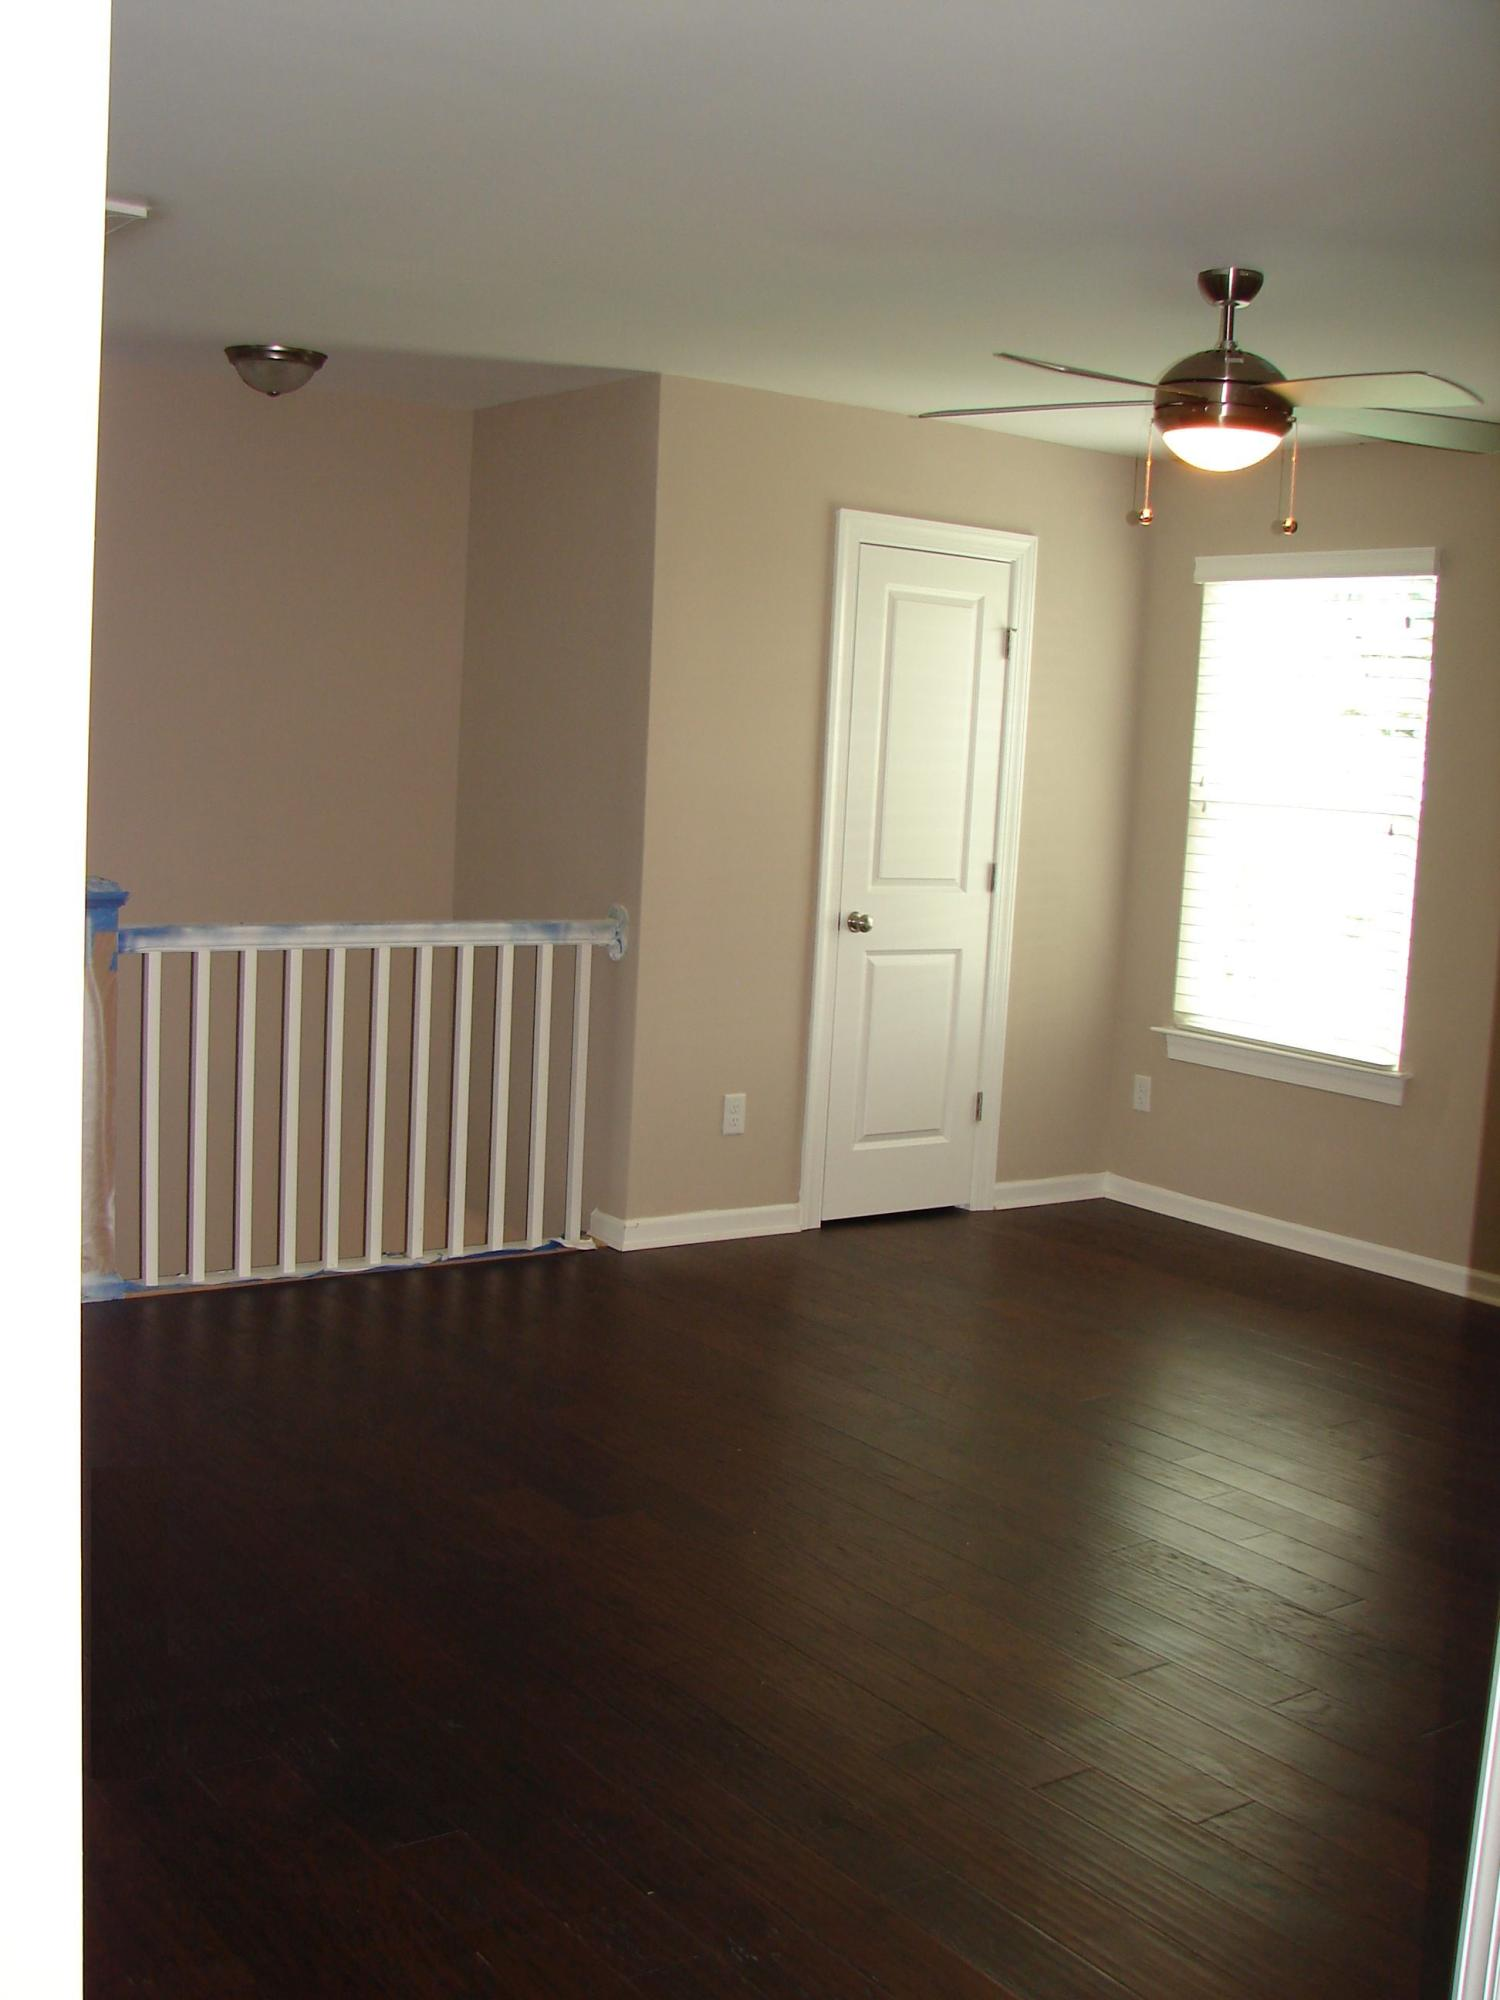 Filbin Creek Homes For Sale - 1173 Sumner, North Charleston, SC - 10